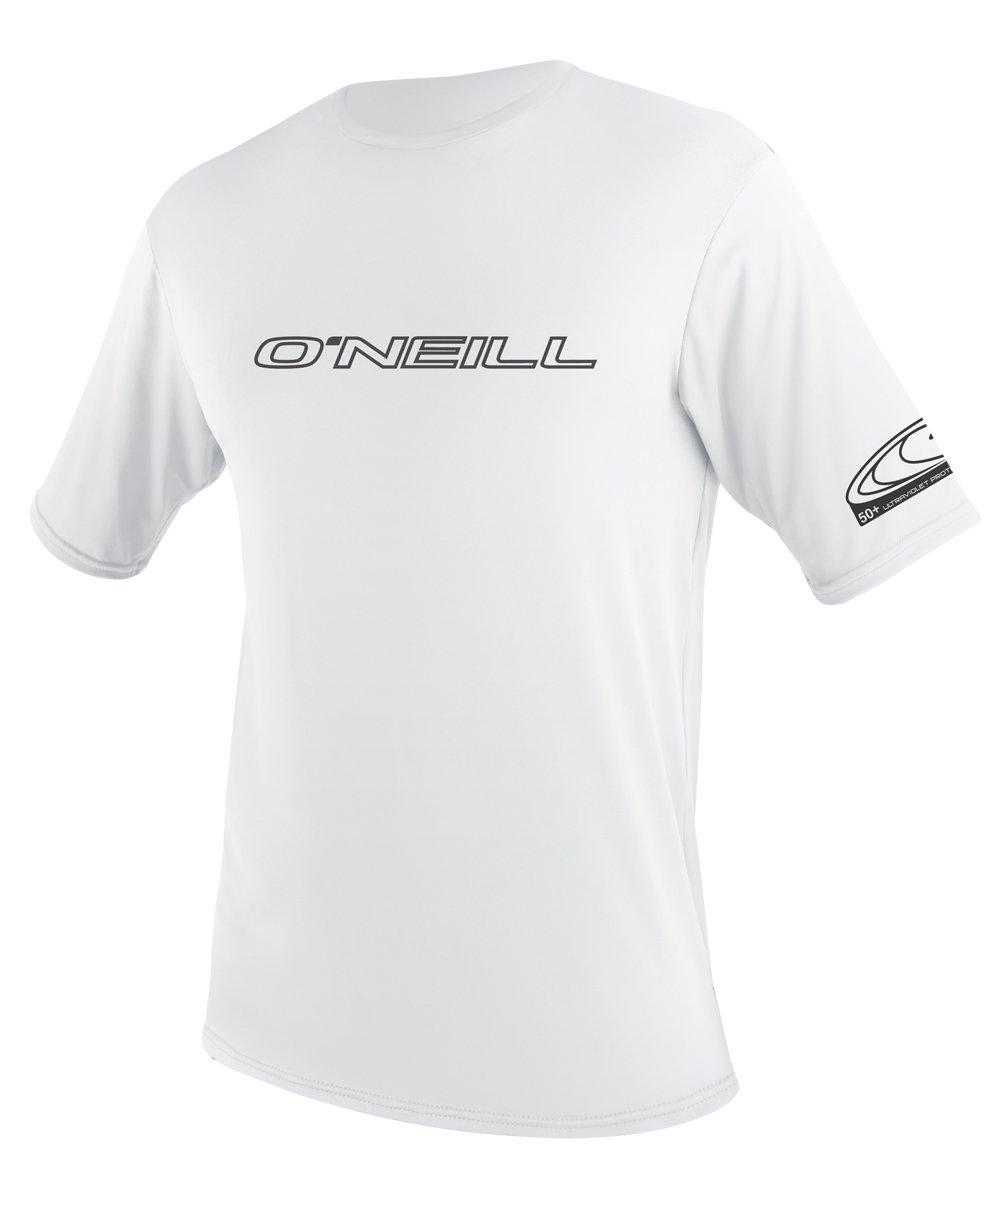 O'Neill UV 50+ Sun Protection Mens Basic Skins Short Sleeve Tee Sun Shirt Rash Guard, White, Large